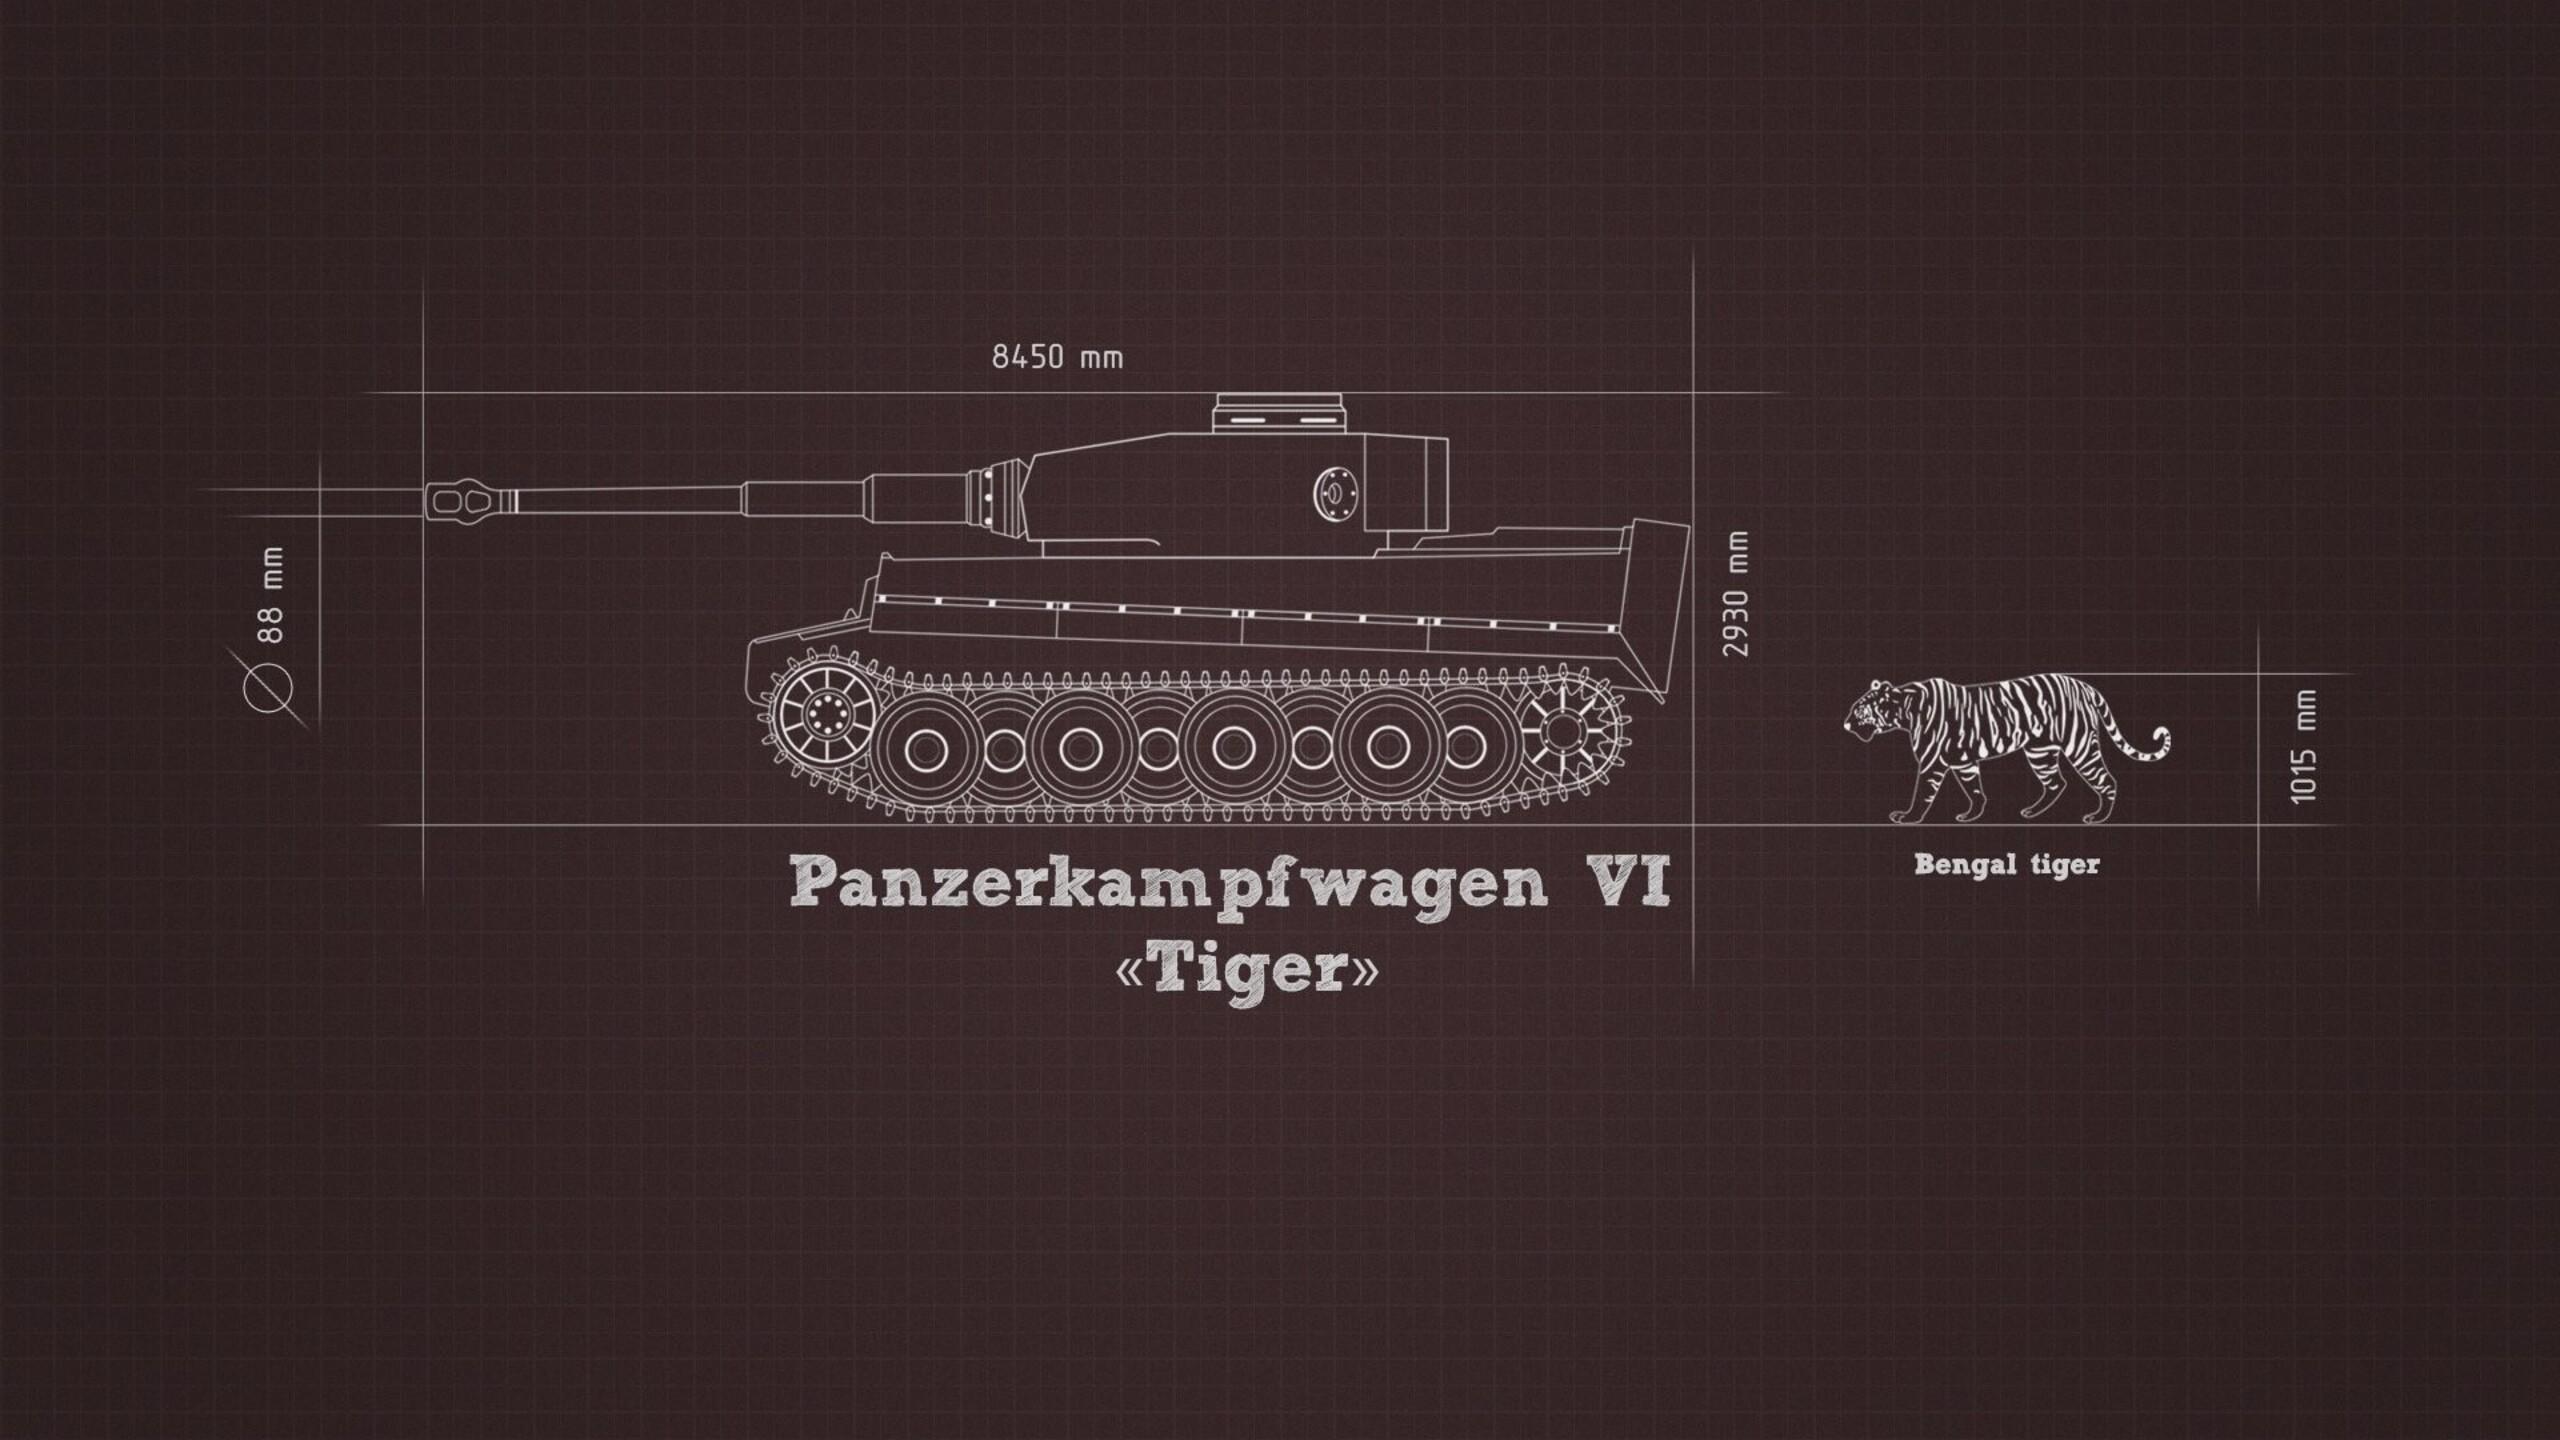 2560x1440 military tank blueprints 1440p resolution hd 4k wallpapers military tank blueprintsg malvernweather Gallery